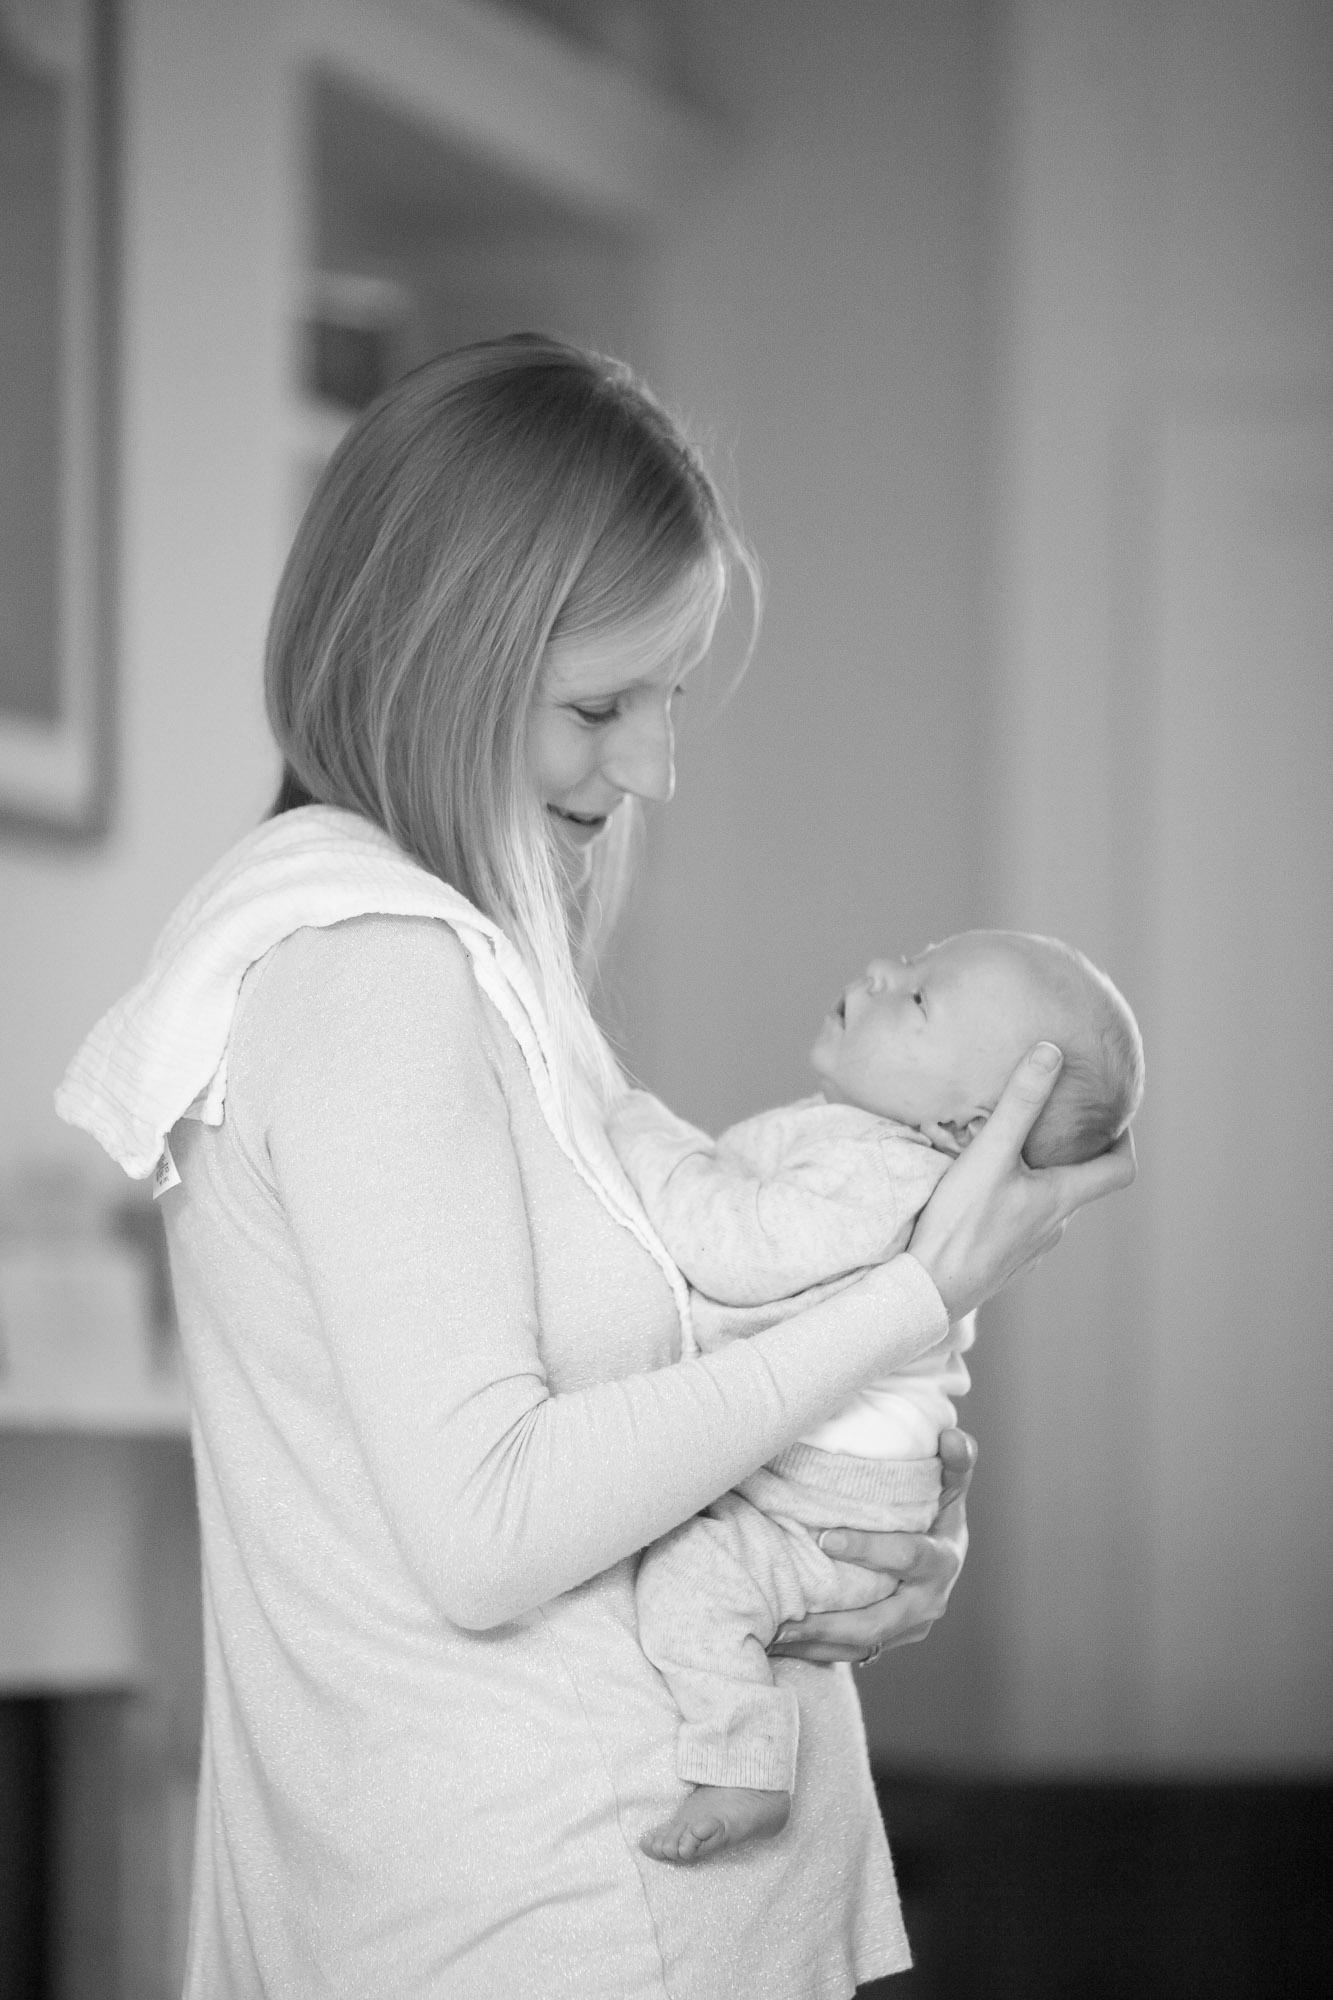 newborn-baby-family-portrait-photographer-005.jpg